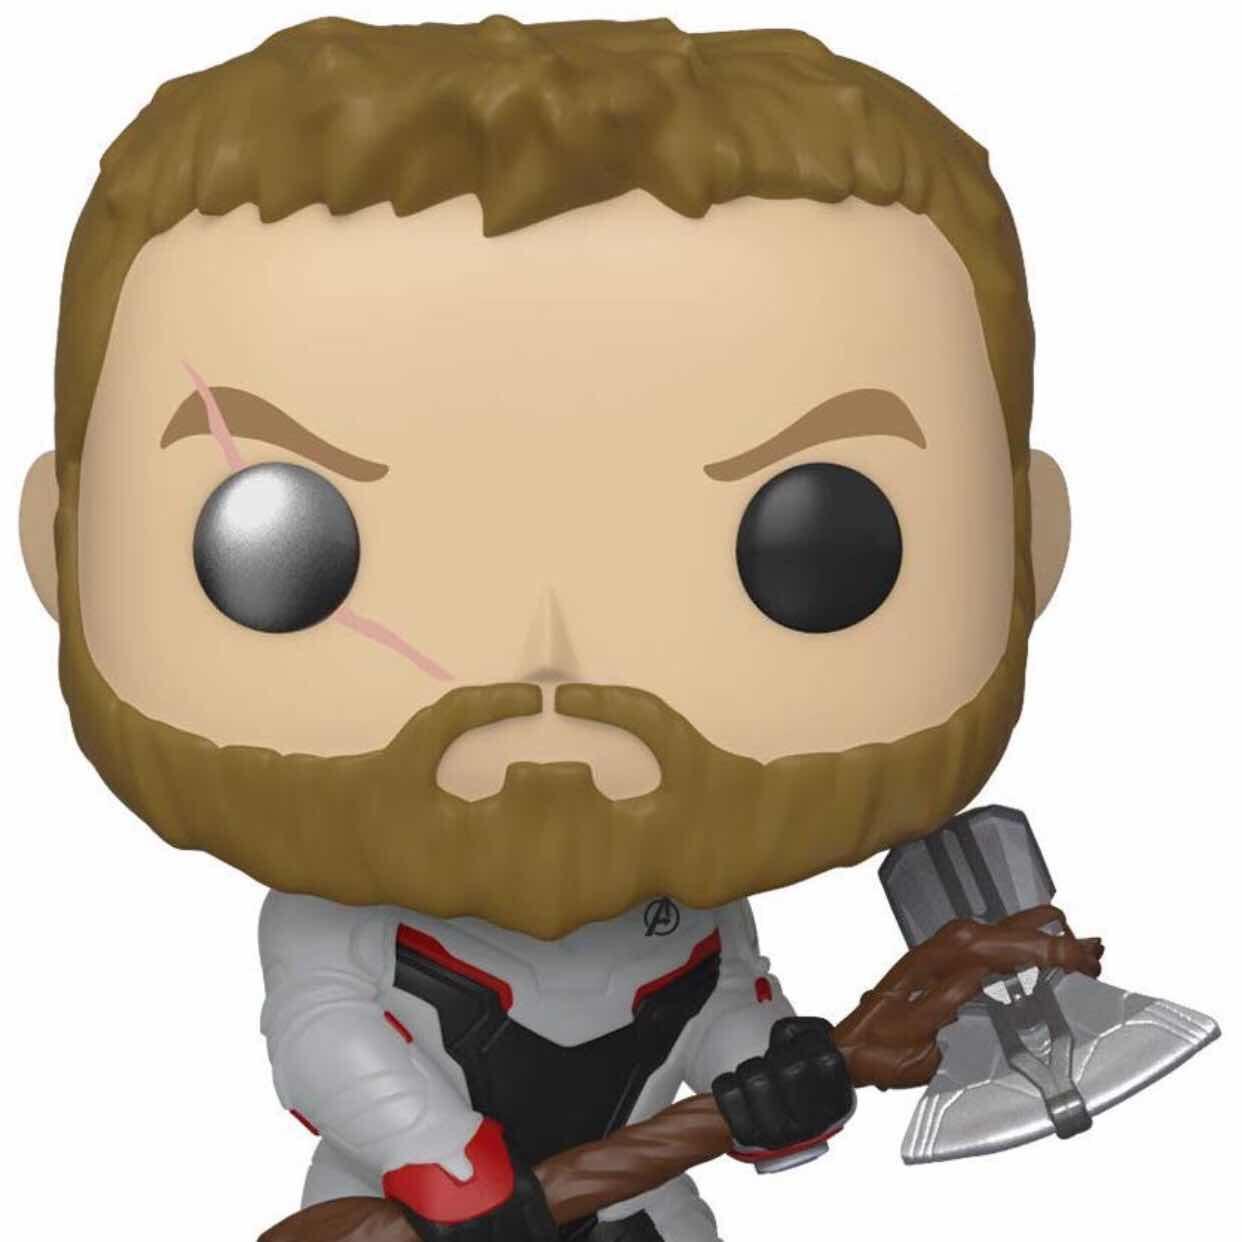 Thor Funko Pop!